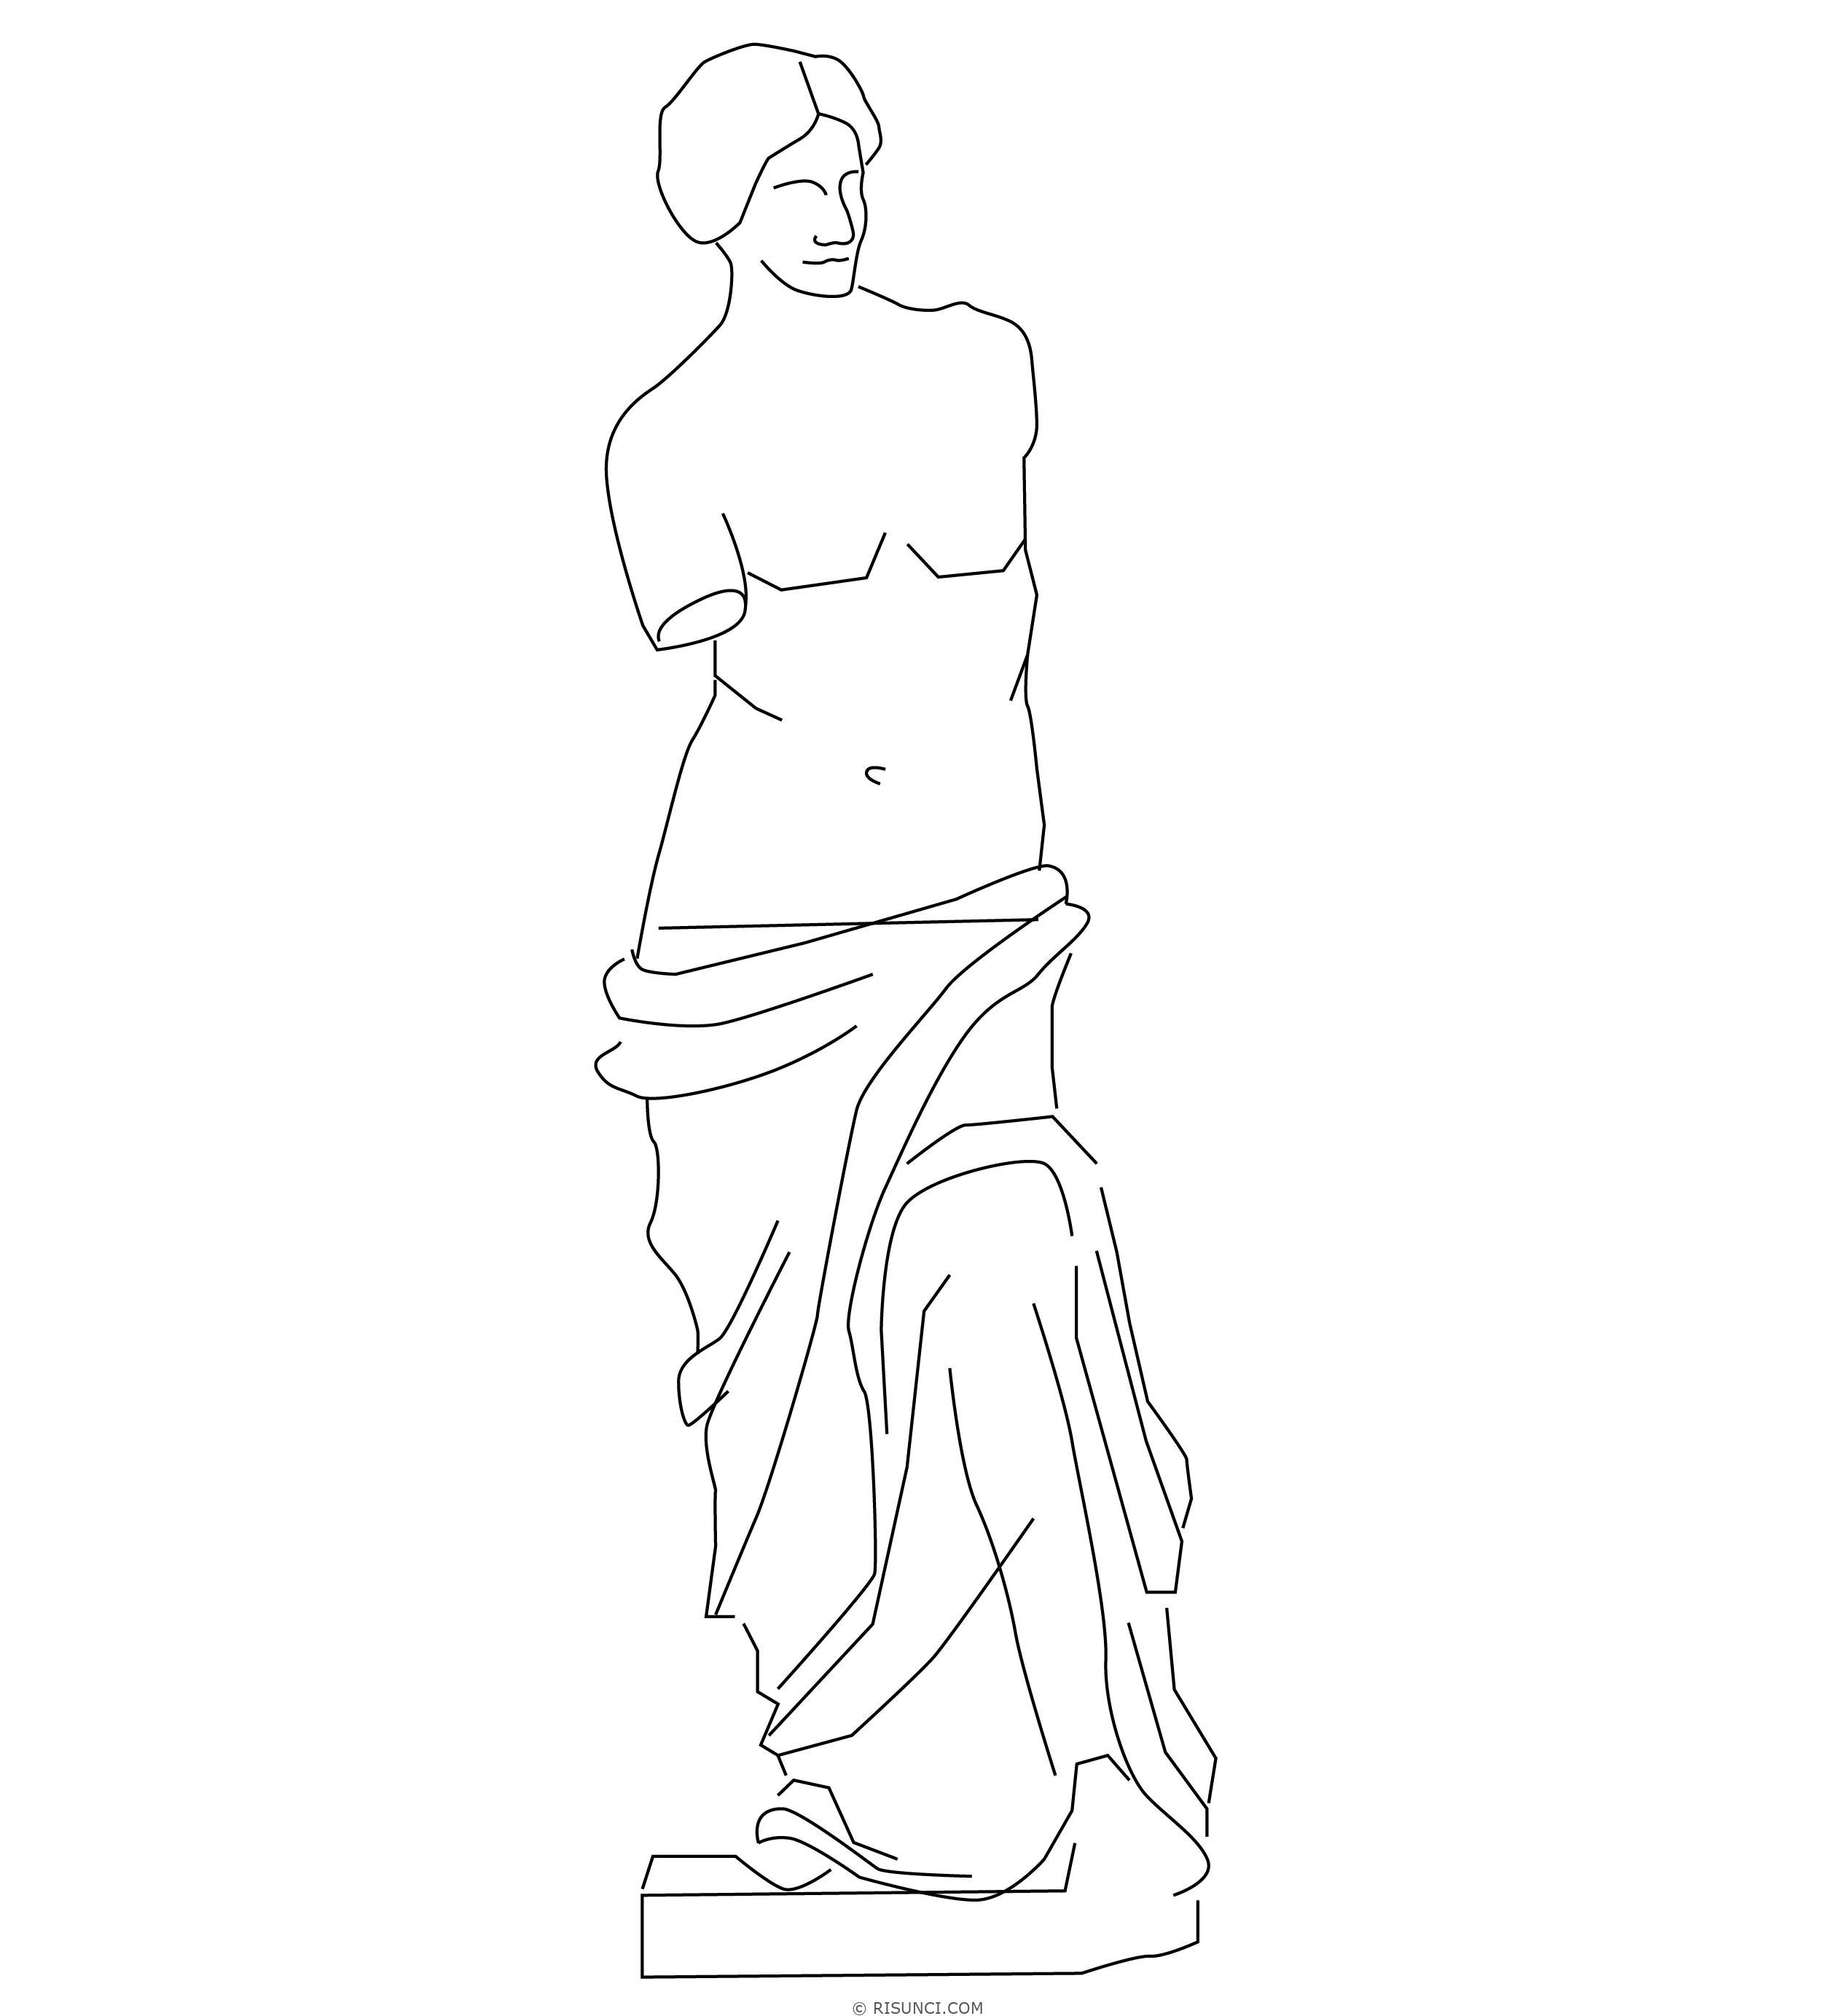 Рисунки скульптуры карандашом поэтапно